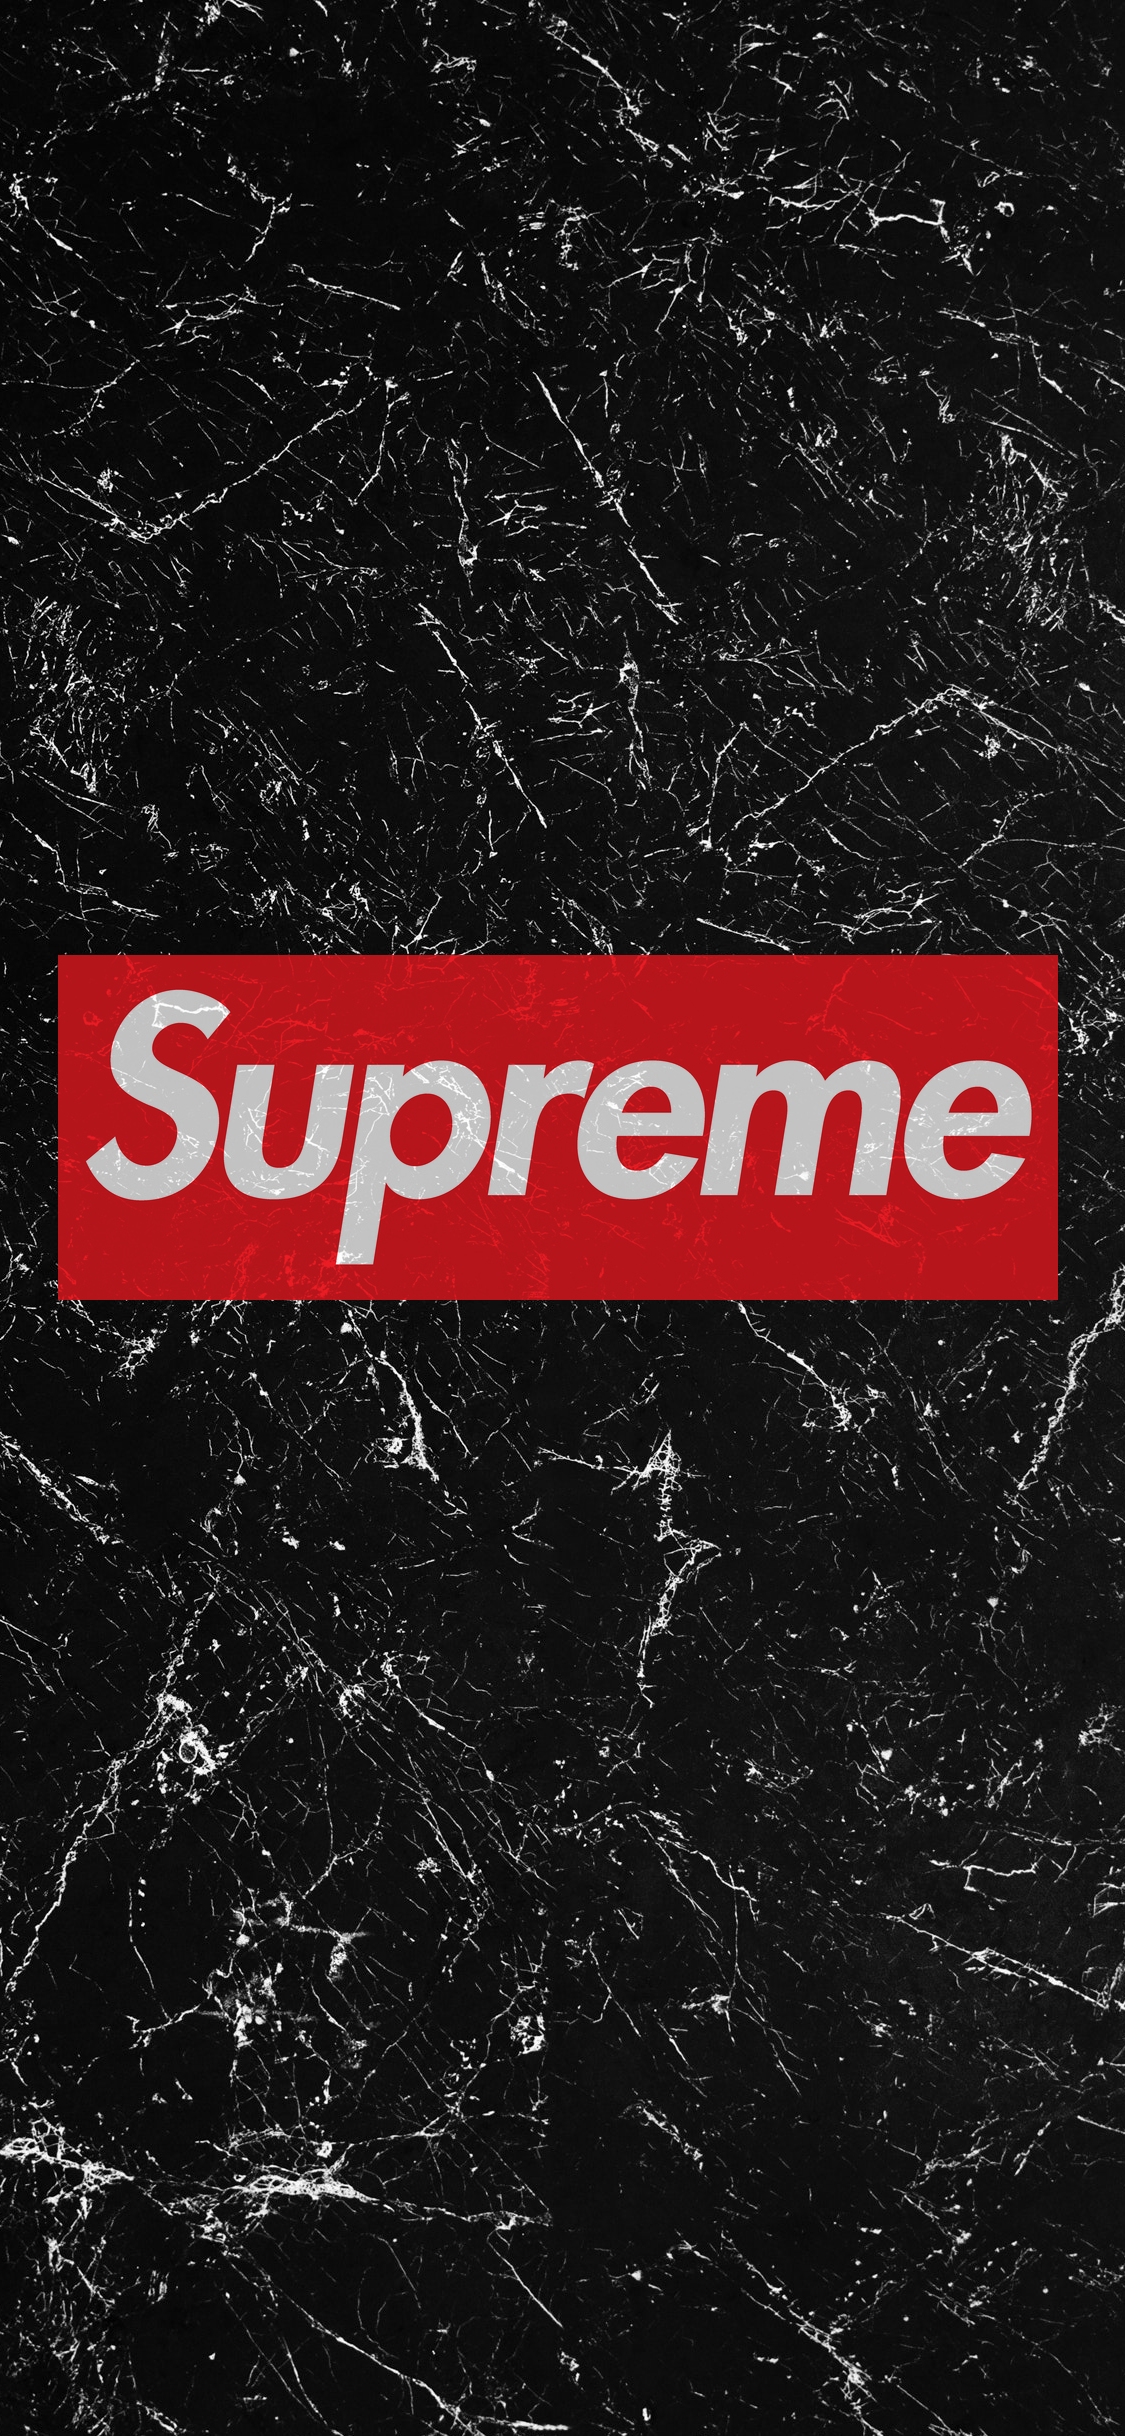 #Supreme #Cool #Wallpaper #Iphone | Обои для iphone, Обои